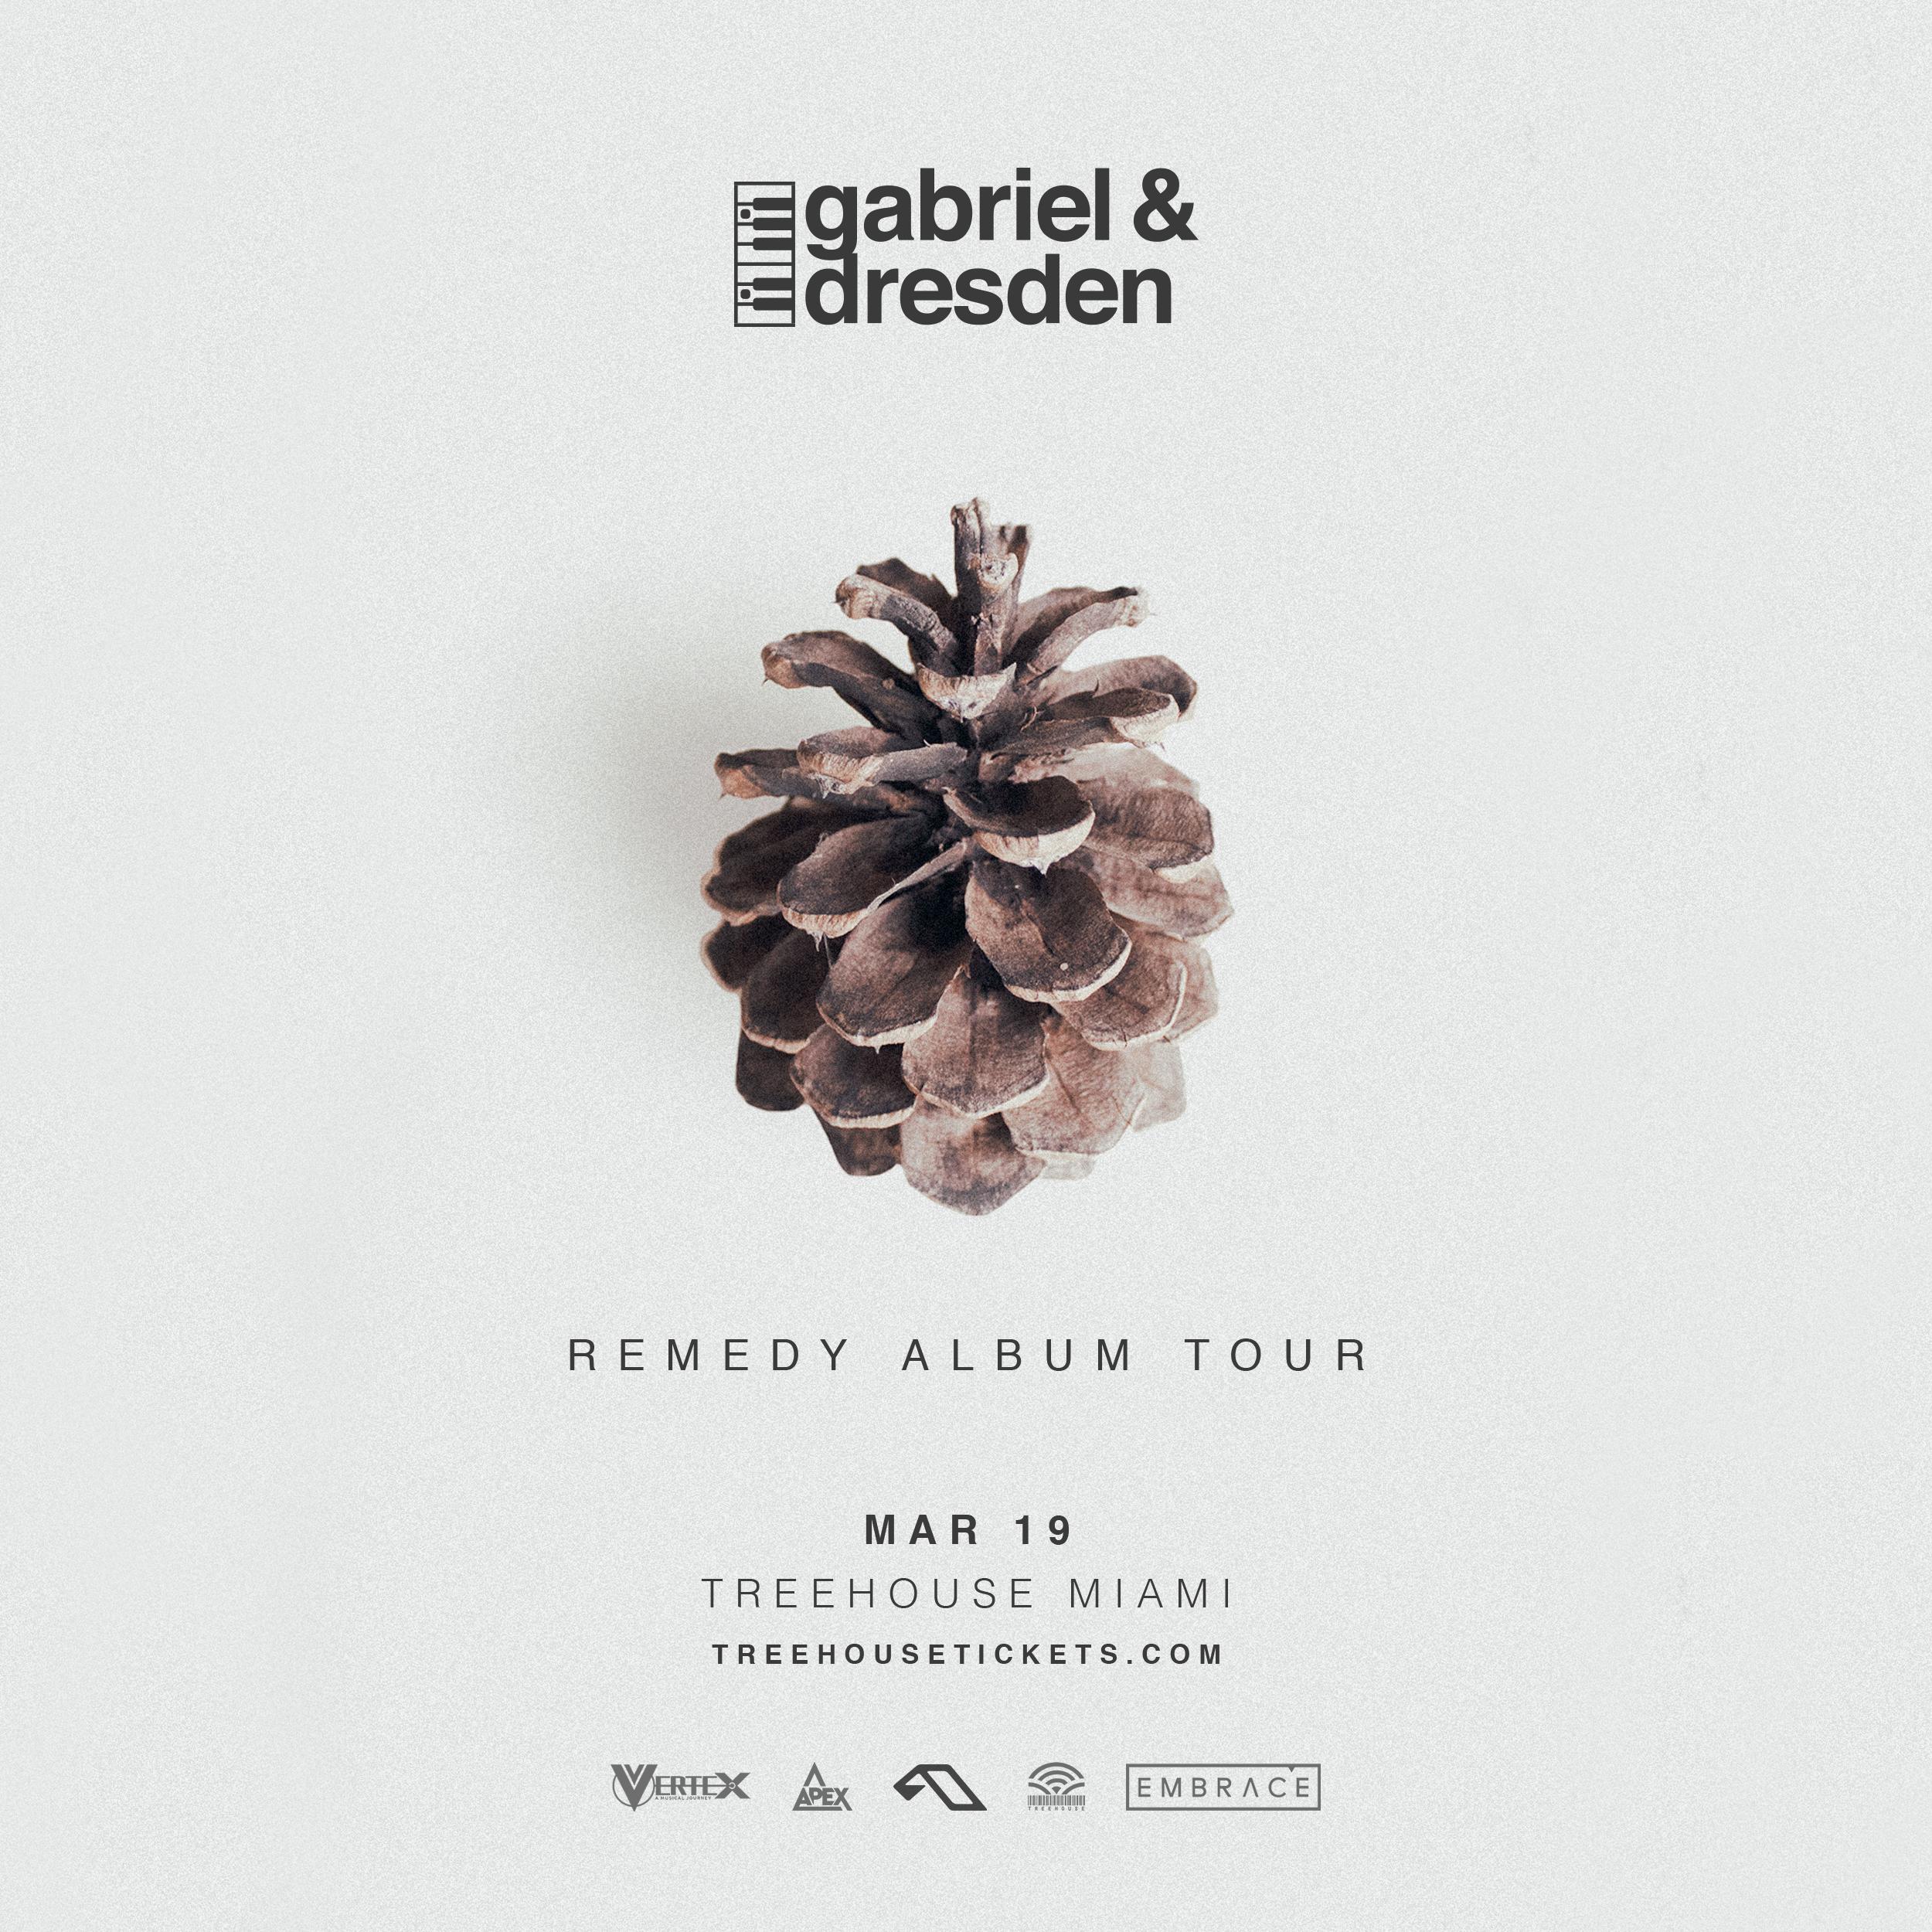 Gabriel & Dresden Presents Remedy Album Party @ Treehouse Miami Flyer